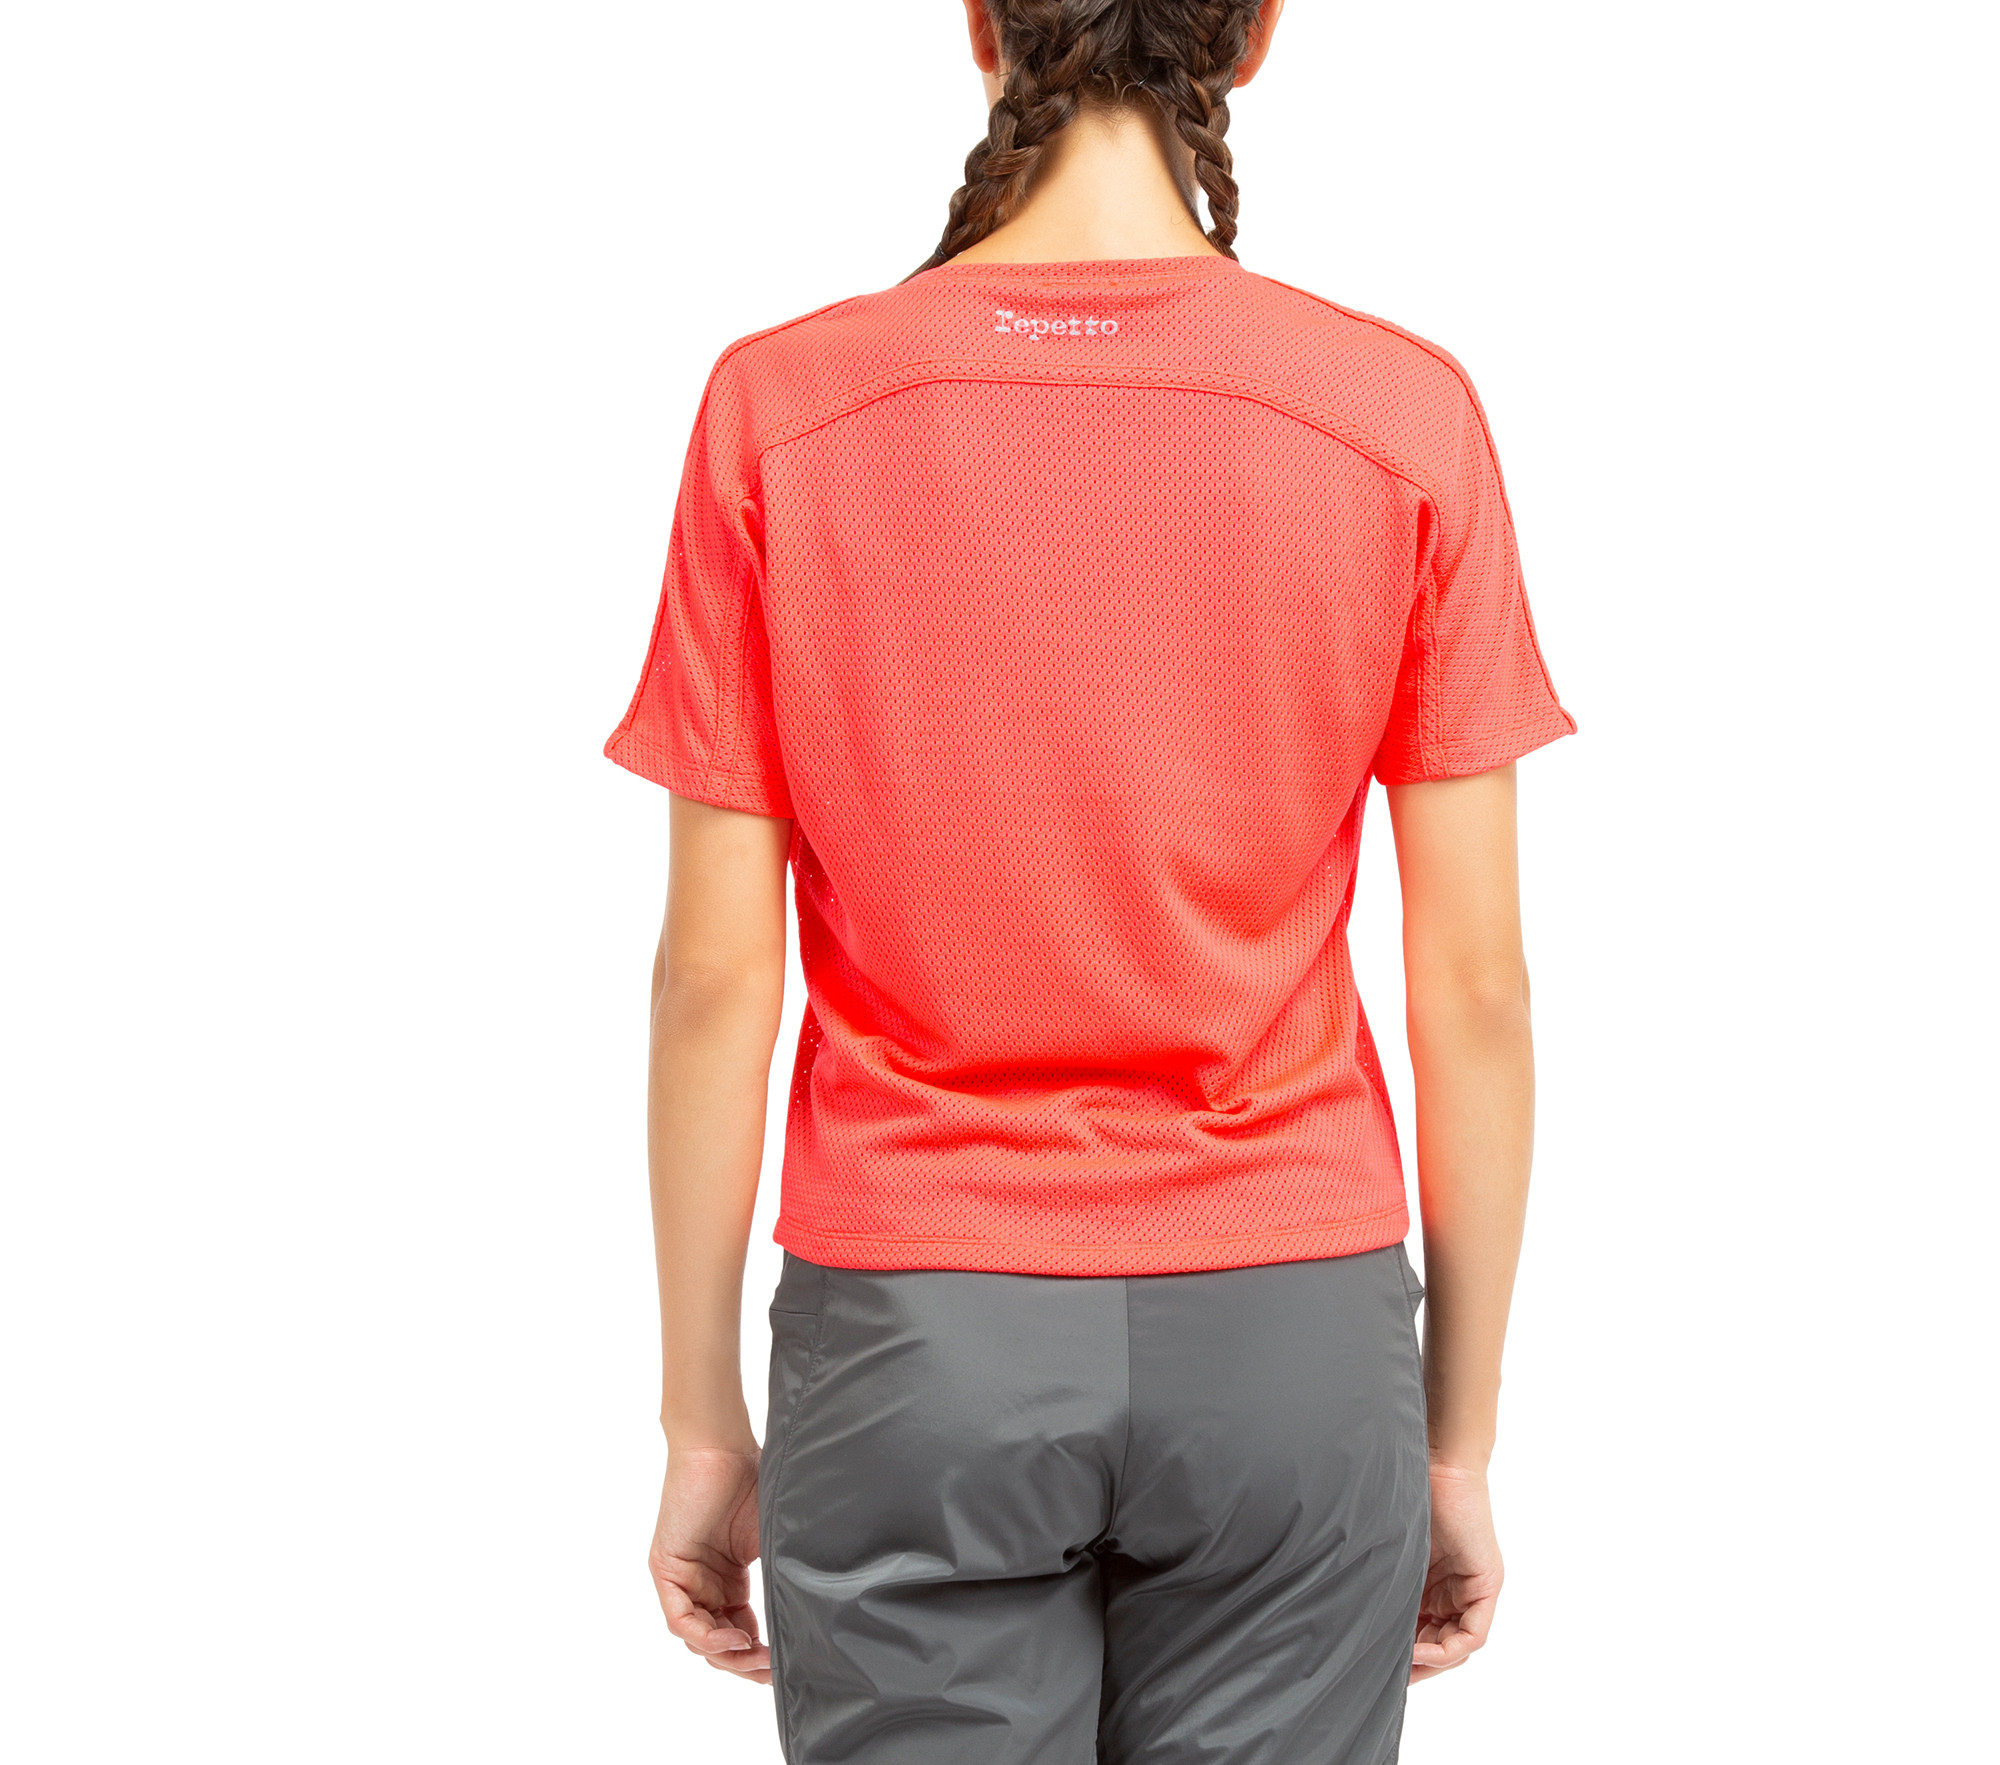 T-Shirt aus atmungsaktivem Mesh